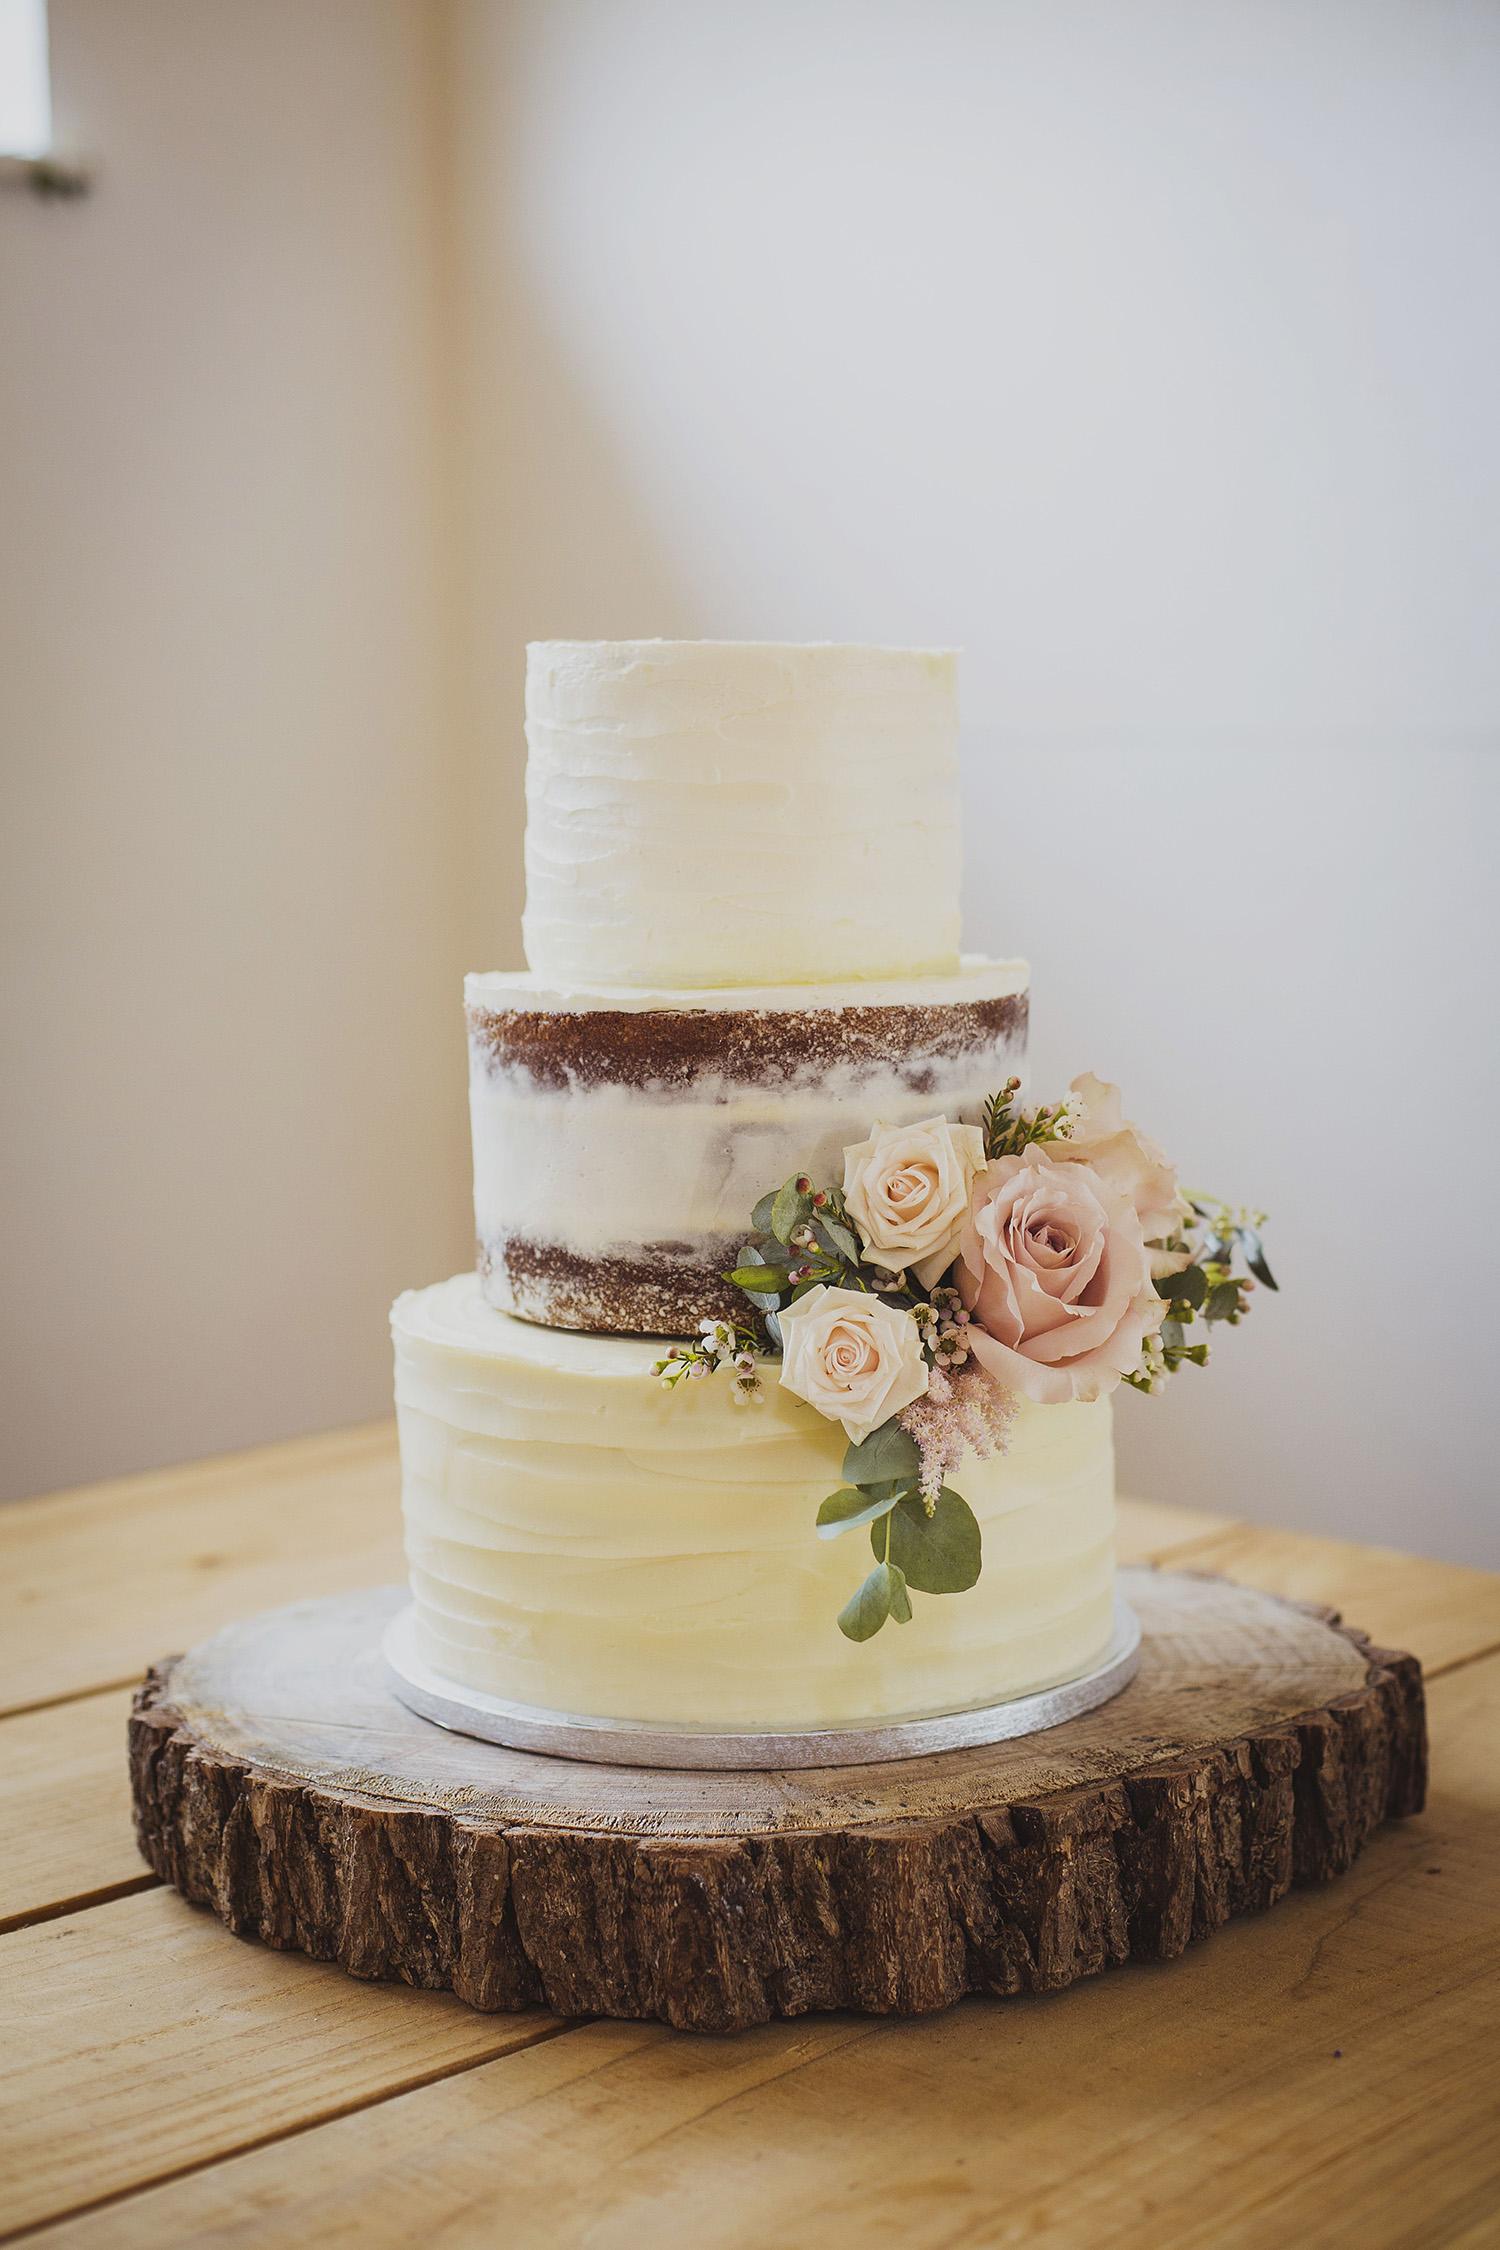 wedding cake at cott farm barn wedding venue somerset